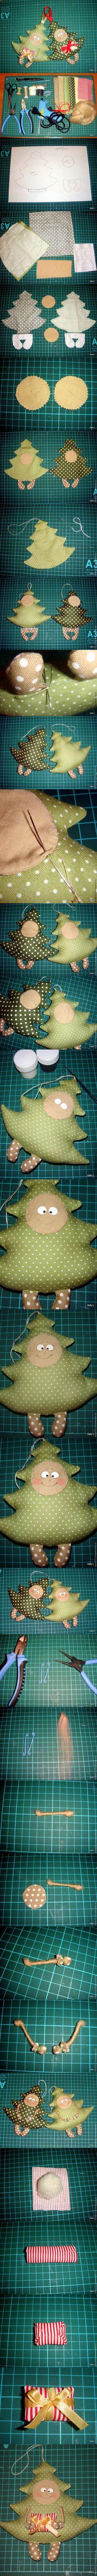 DIY Funny Fabric Christmas Tree DIY Funny Fabric Christmas Tree